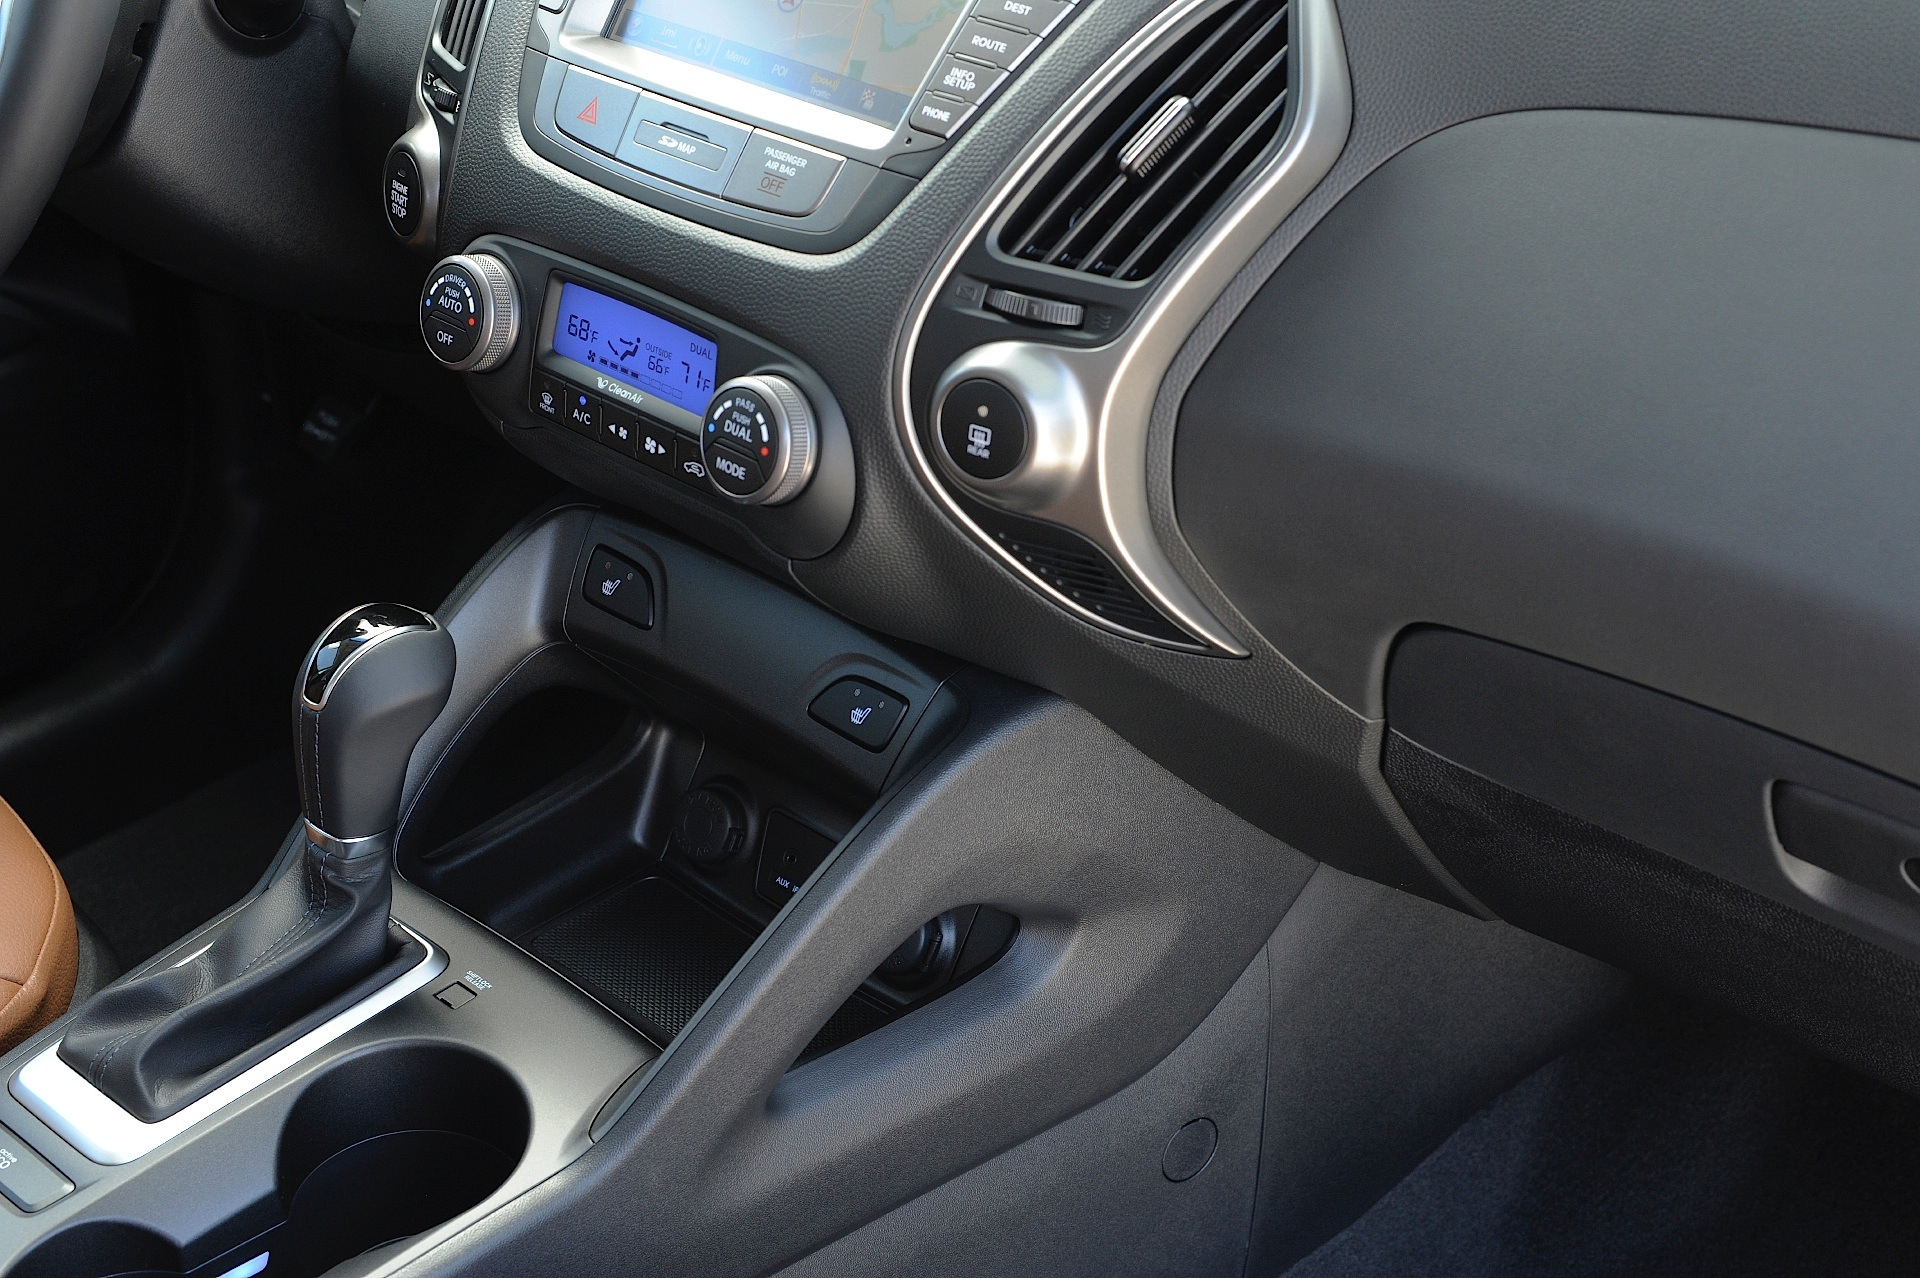 2014 Hyundai Ix35 Interior